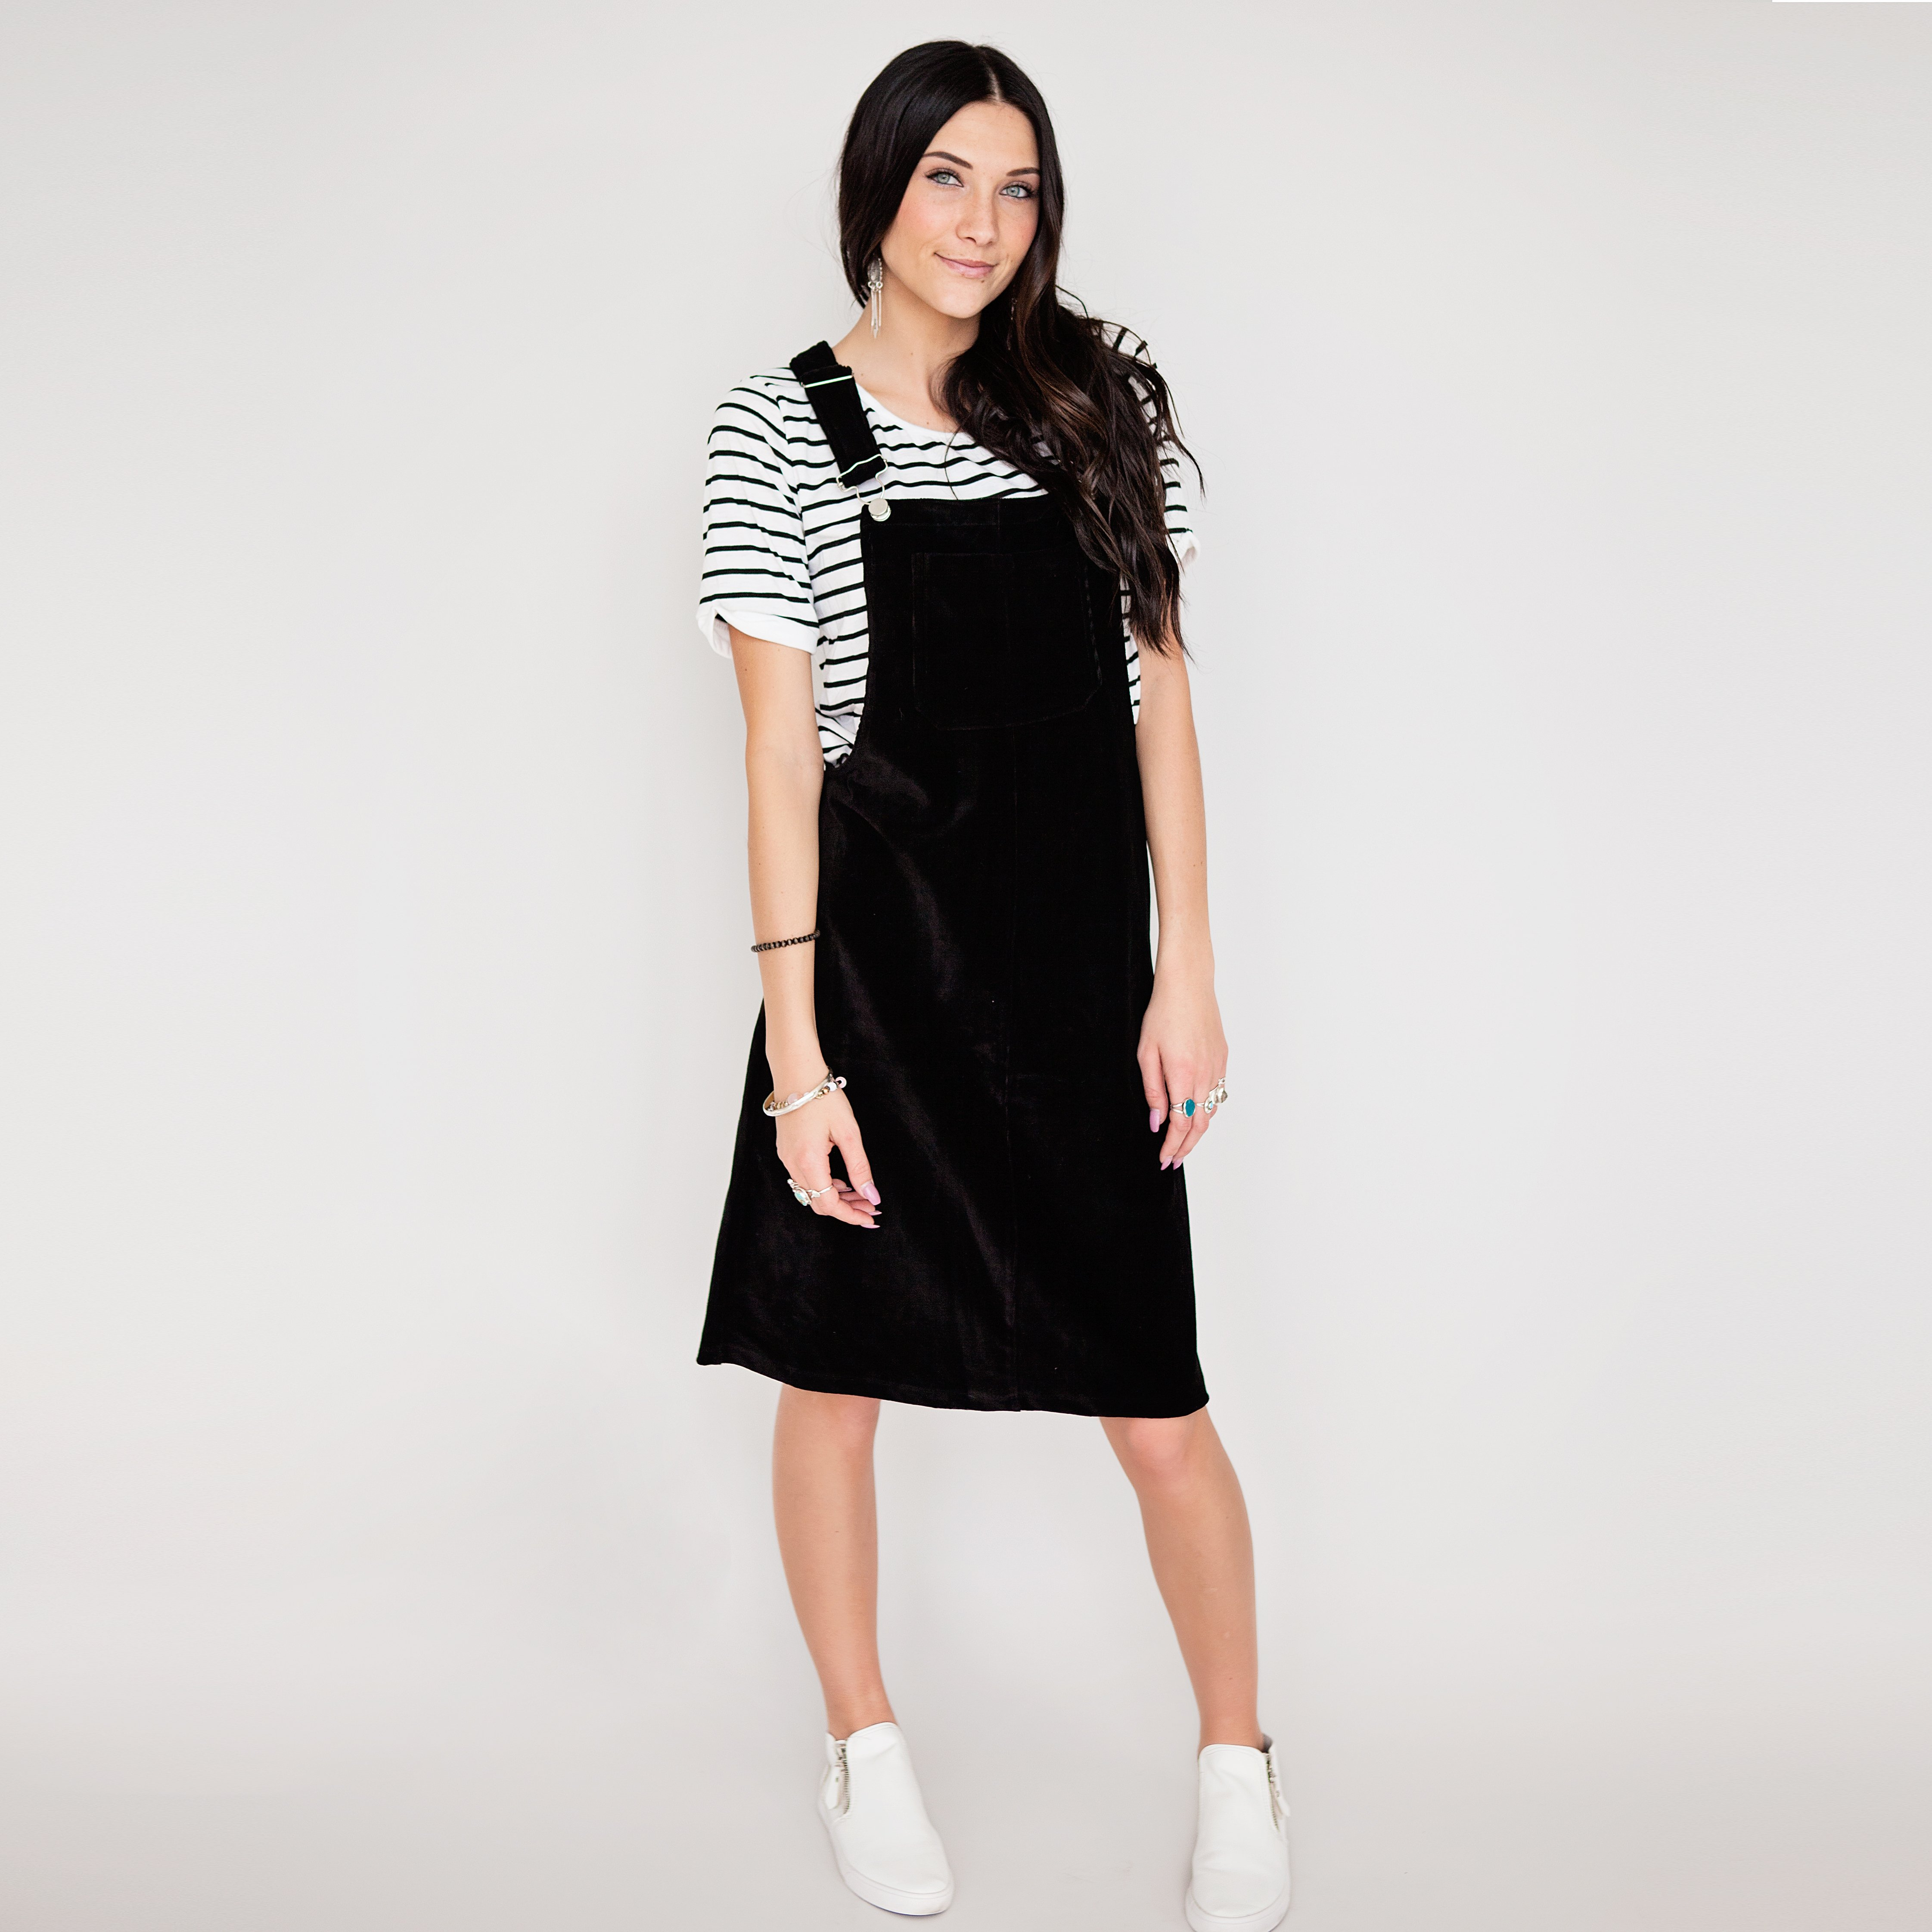 The comfort of a jumper dress